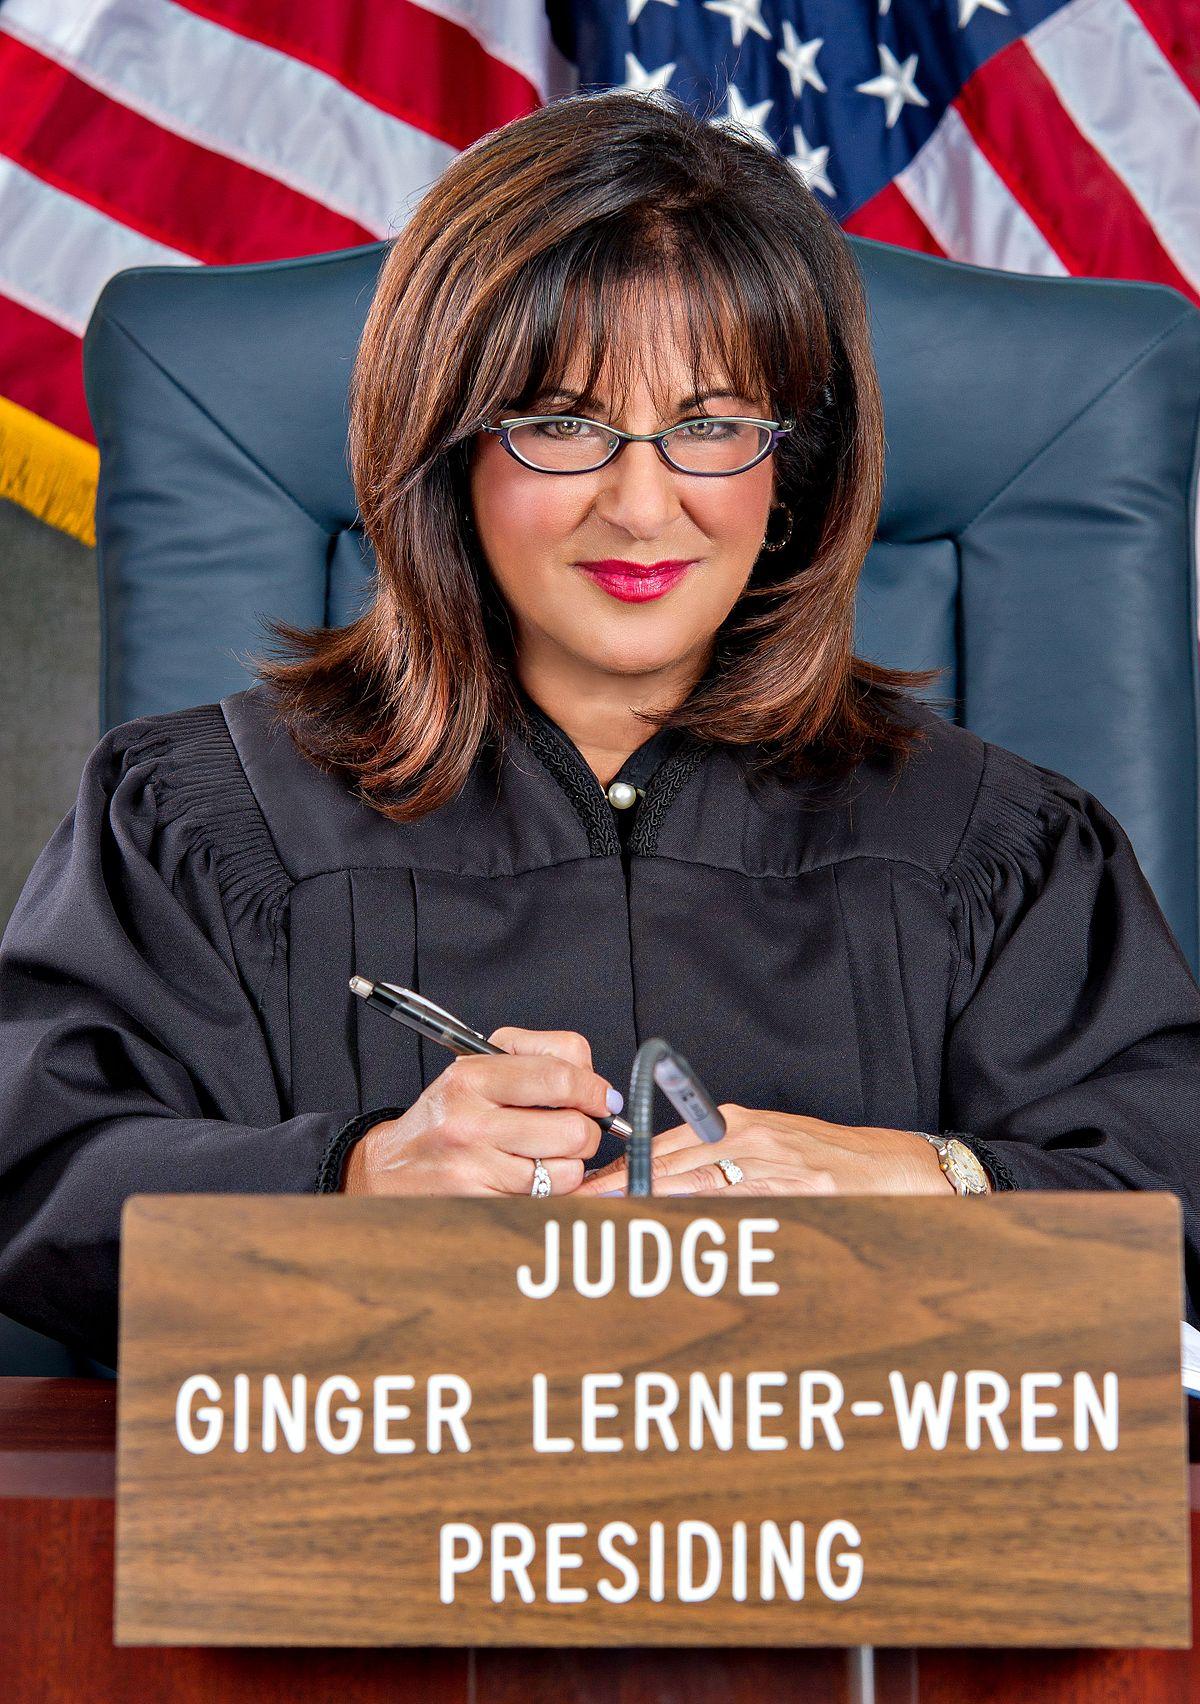 University Of Florida Law School >> Ginger Lerner-Wren - Wikipedia